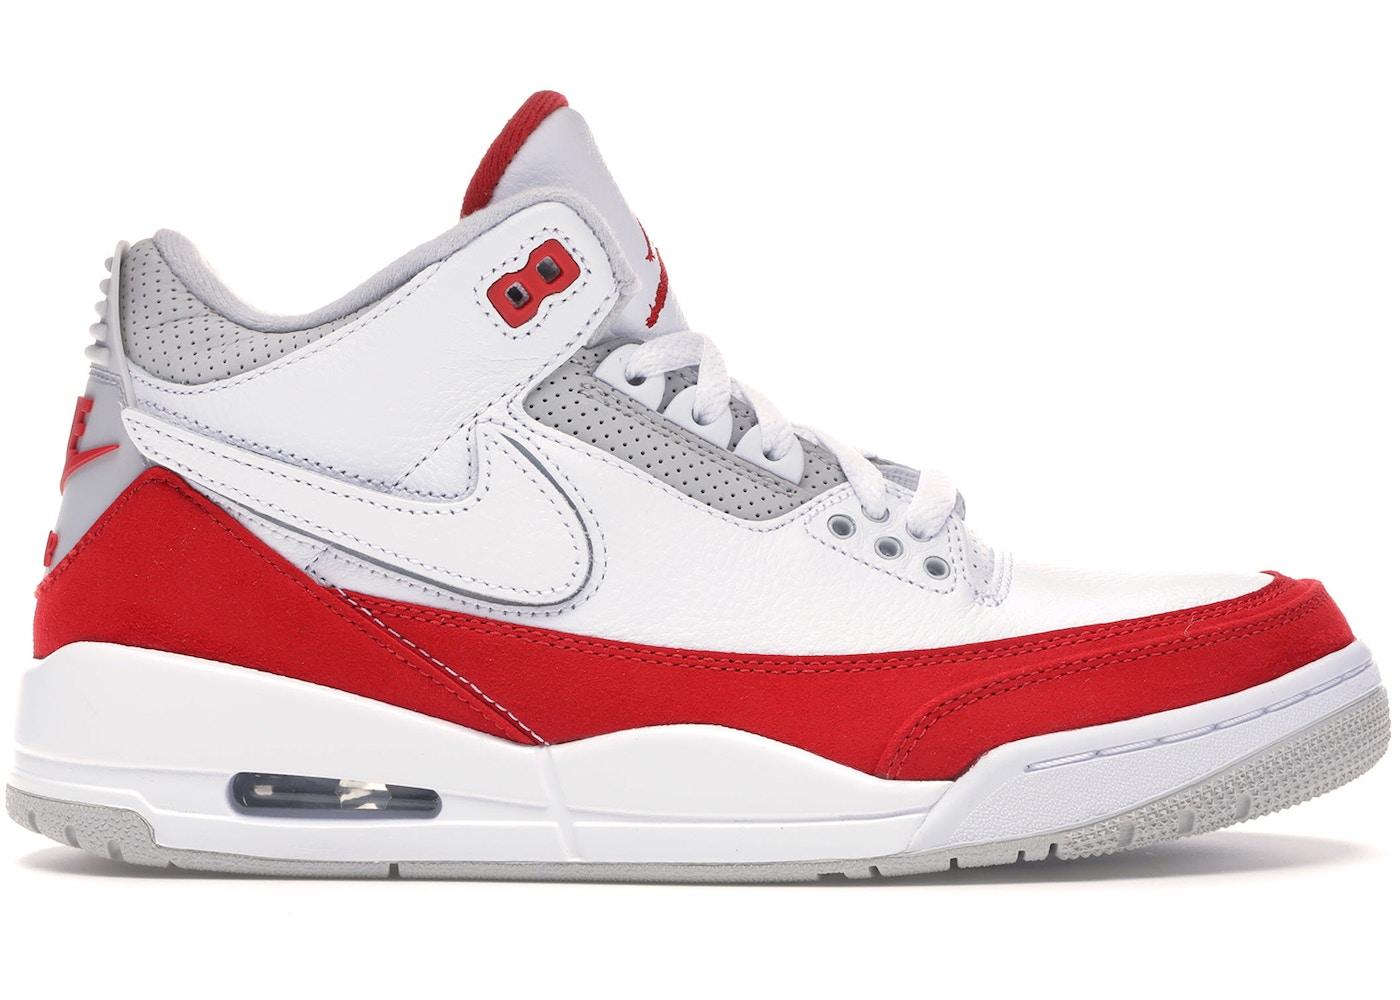 Zapatos equivocado contar  Jordan 3 Retro Tinker White University Red - CJ0939-100